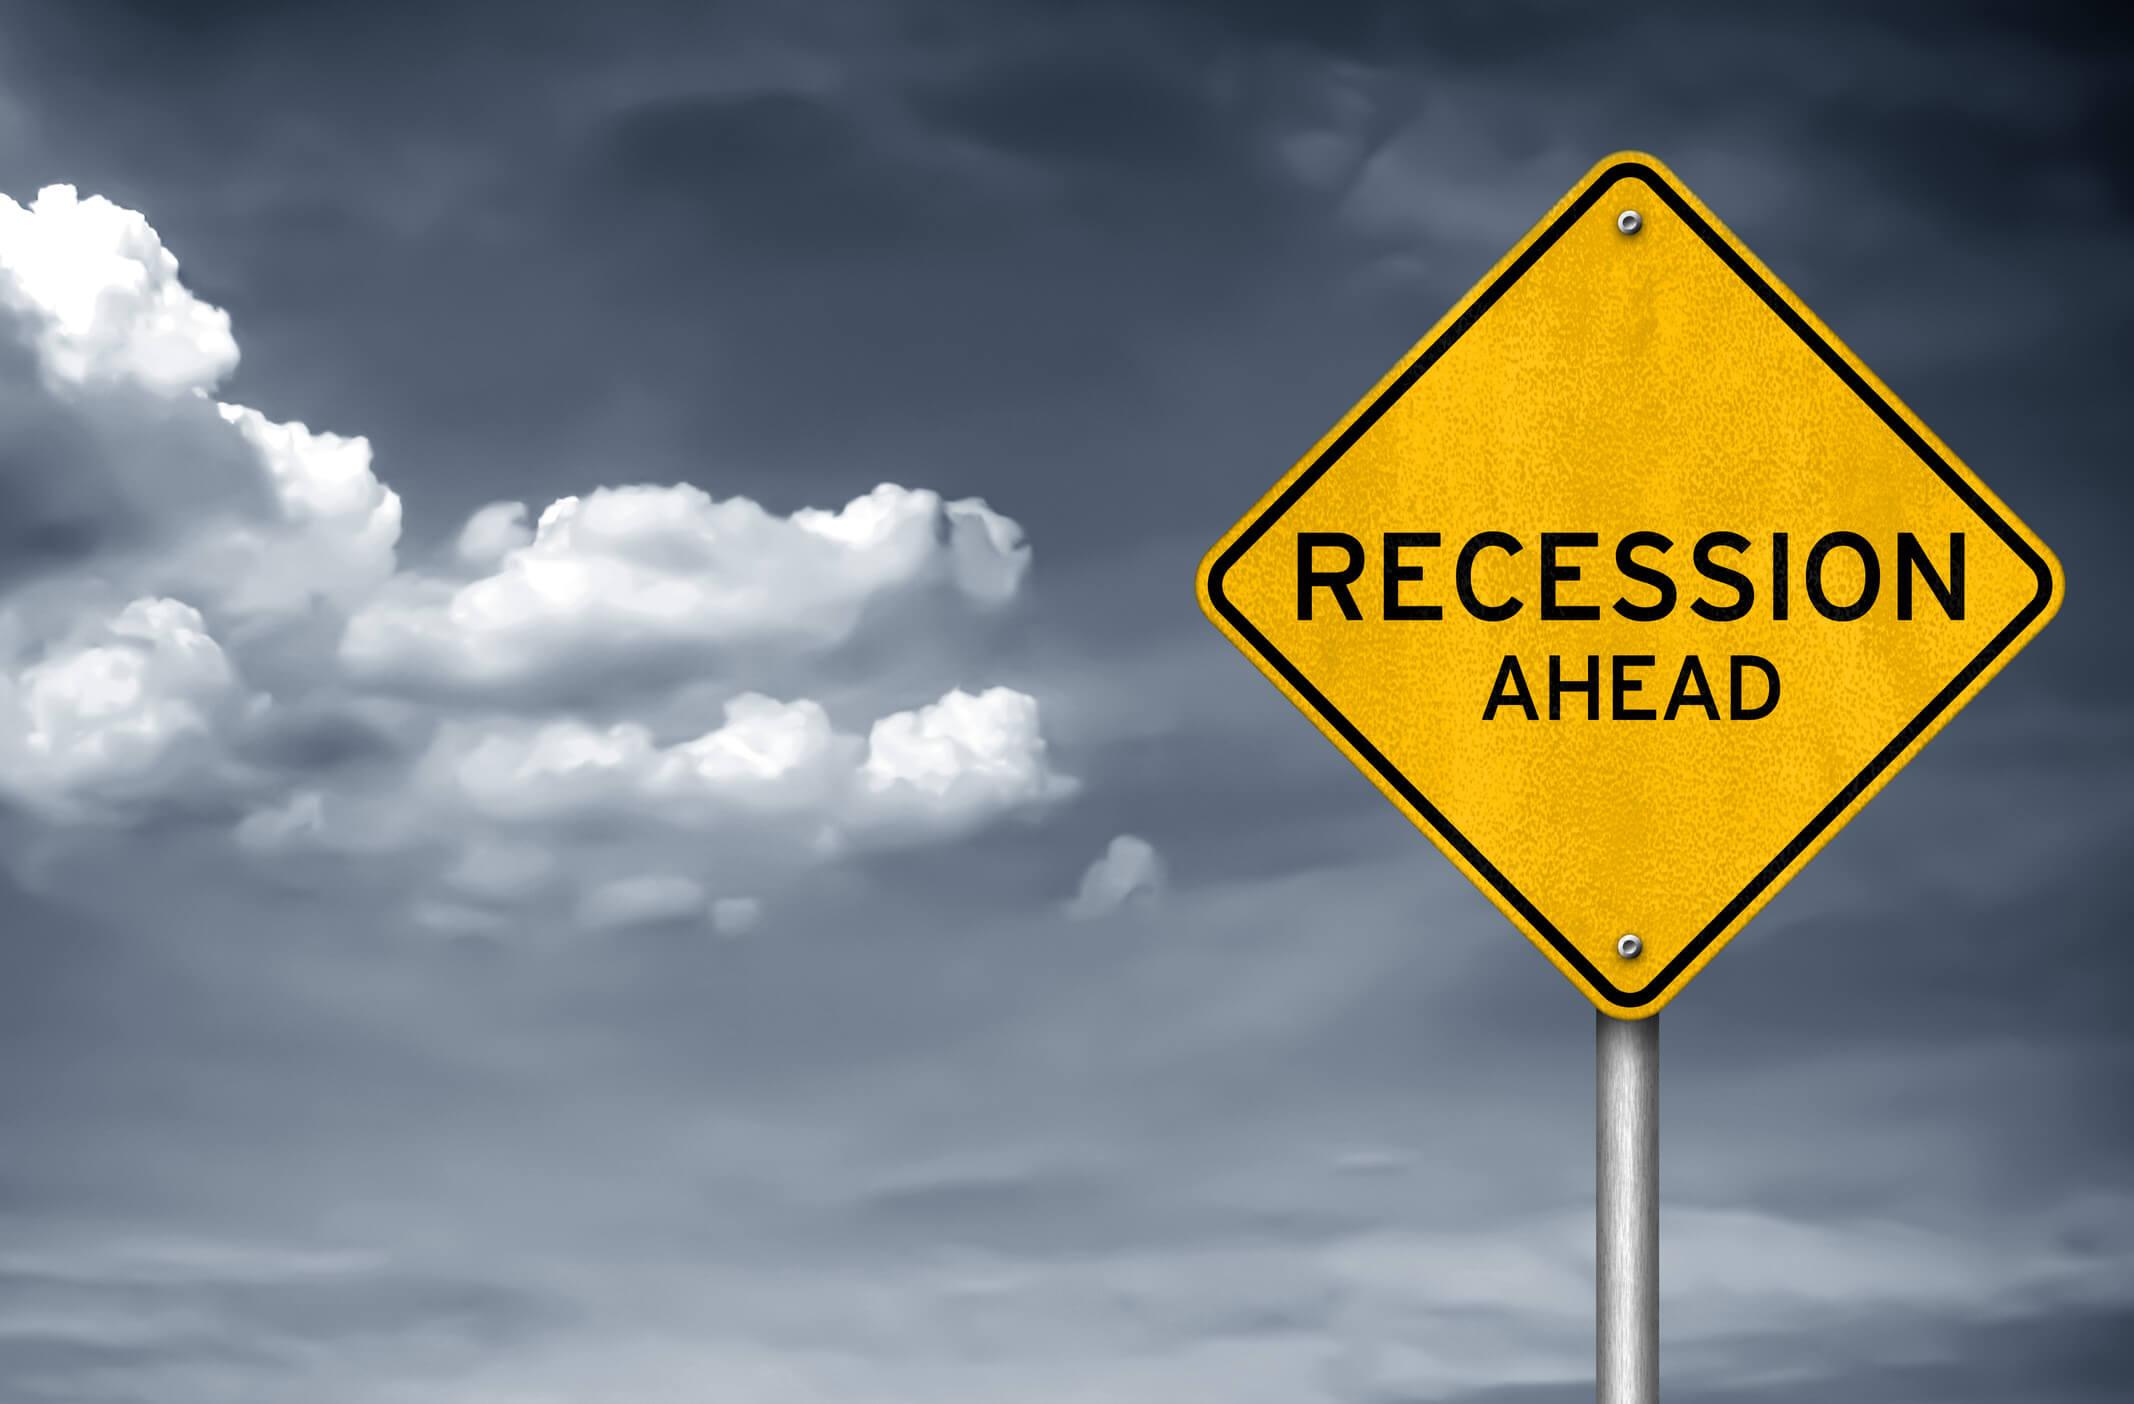 recessionary preparation - Complete Controller